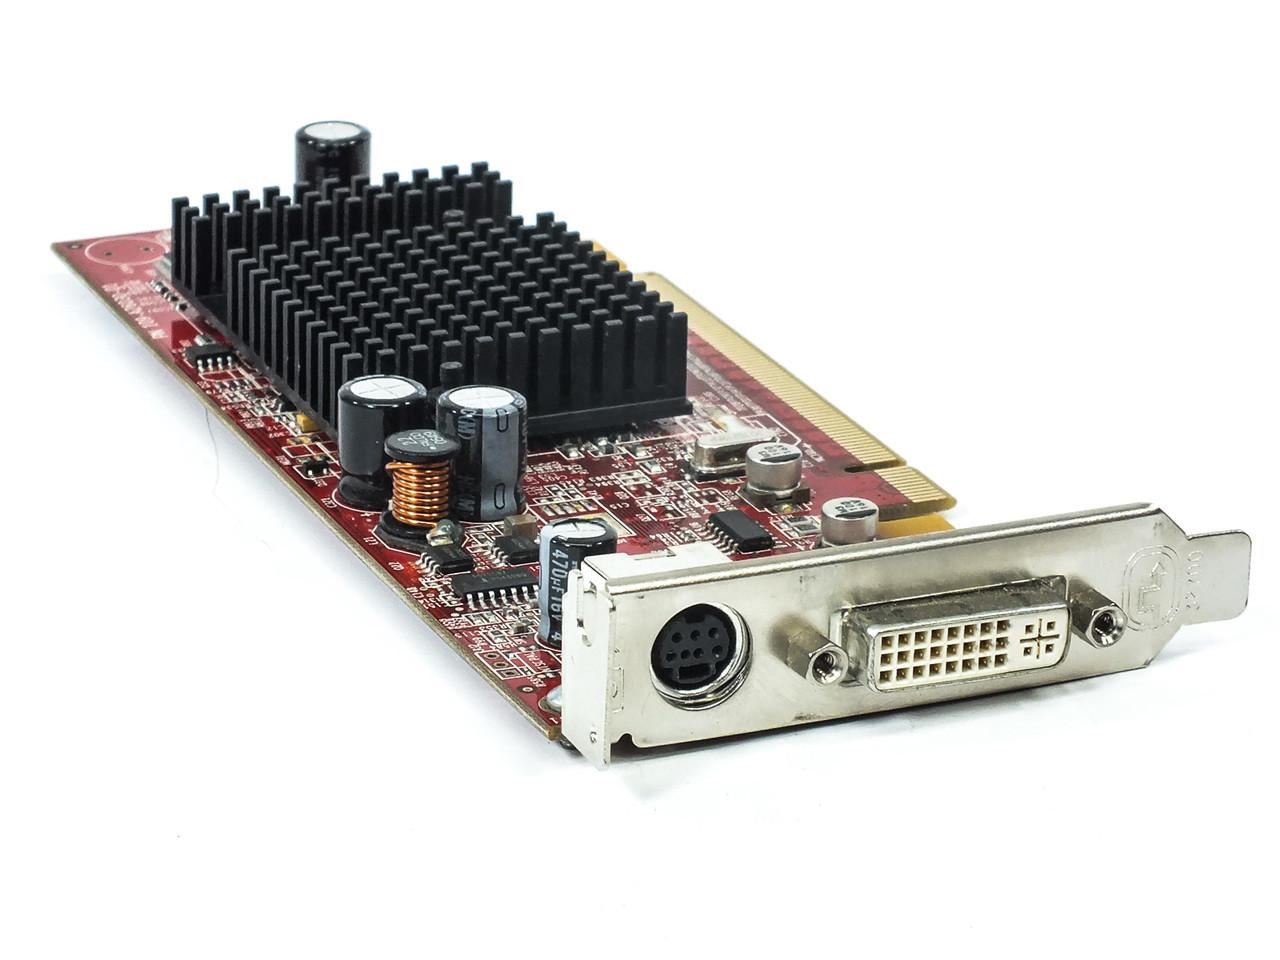 ATI Radeon Genuine X600 Computer Graphics Video Card Low Profile 256MB 102A6290800 0G9184